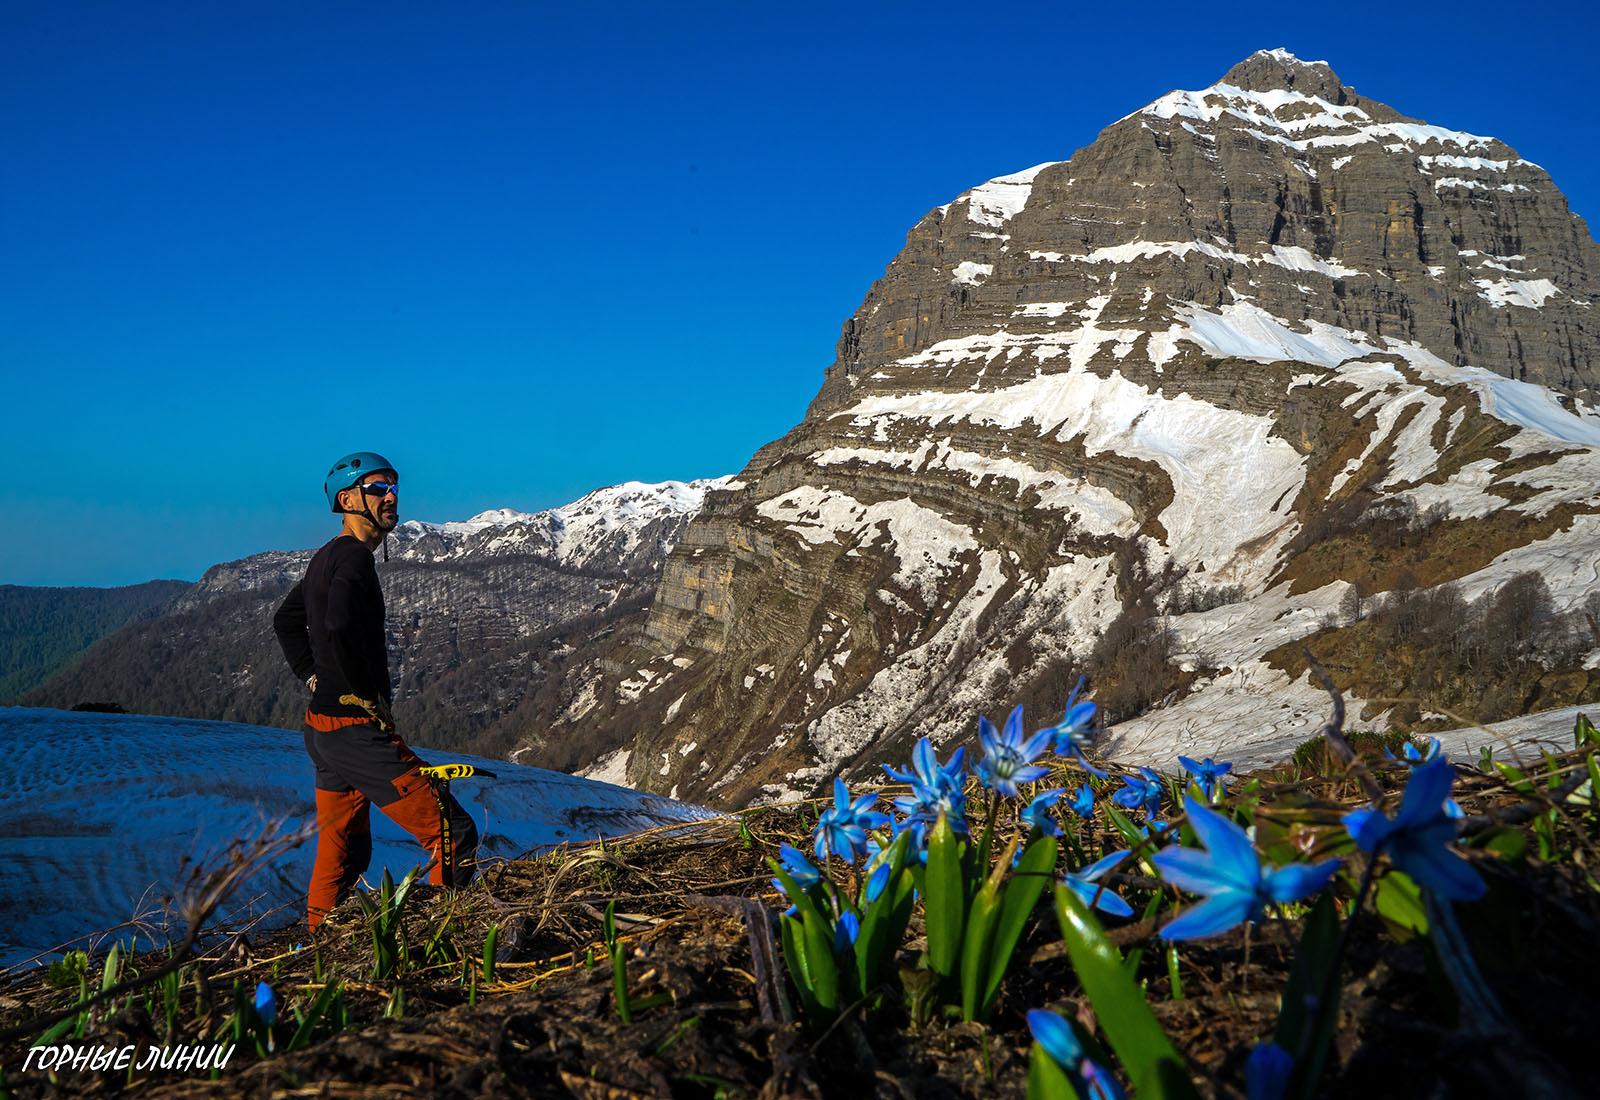 Походы в горы Абхазии. Ахибаху